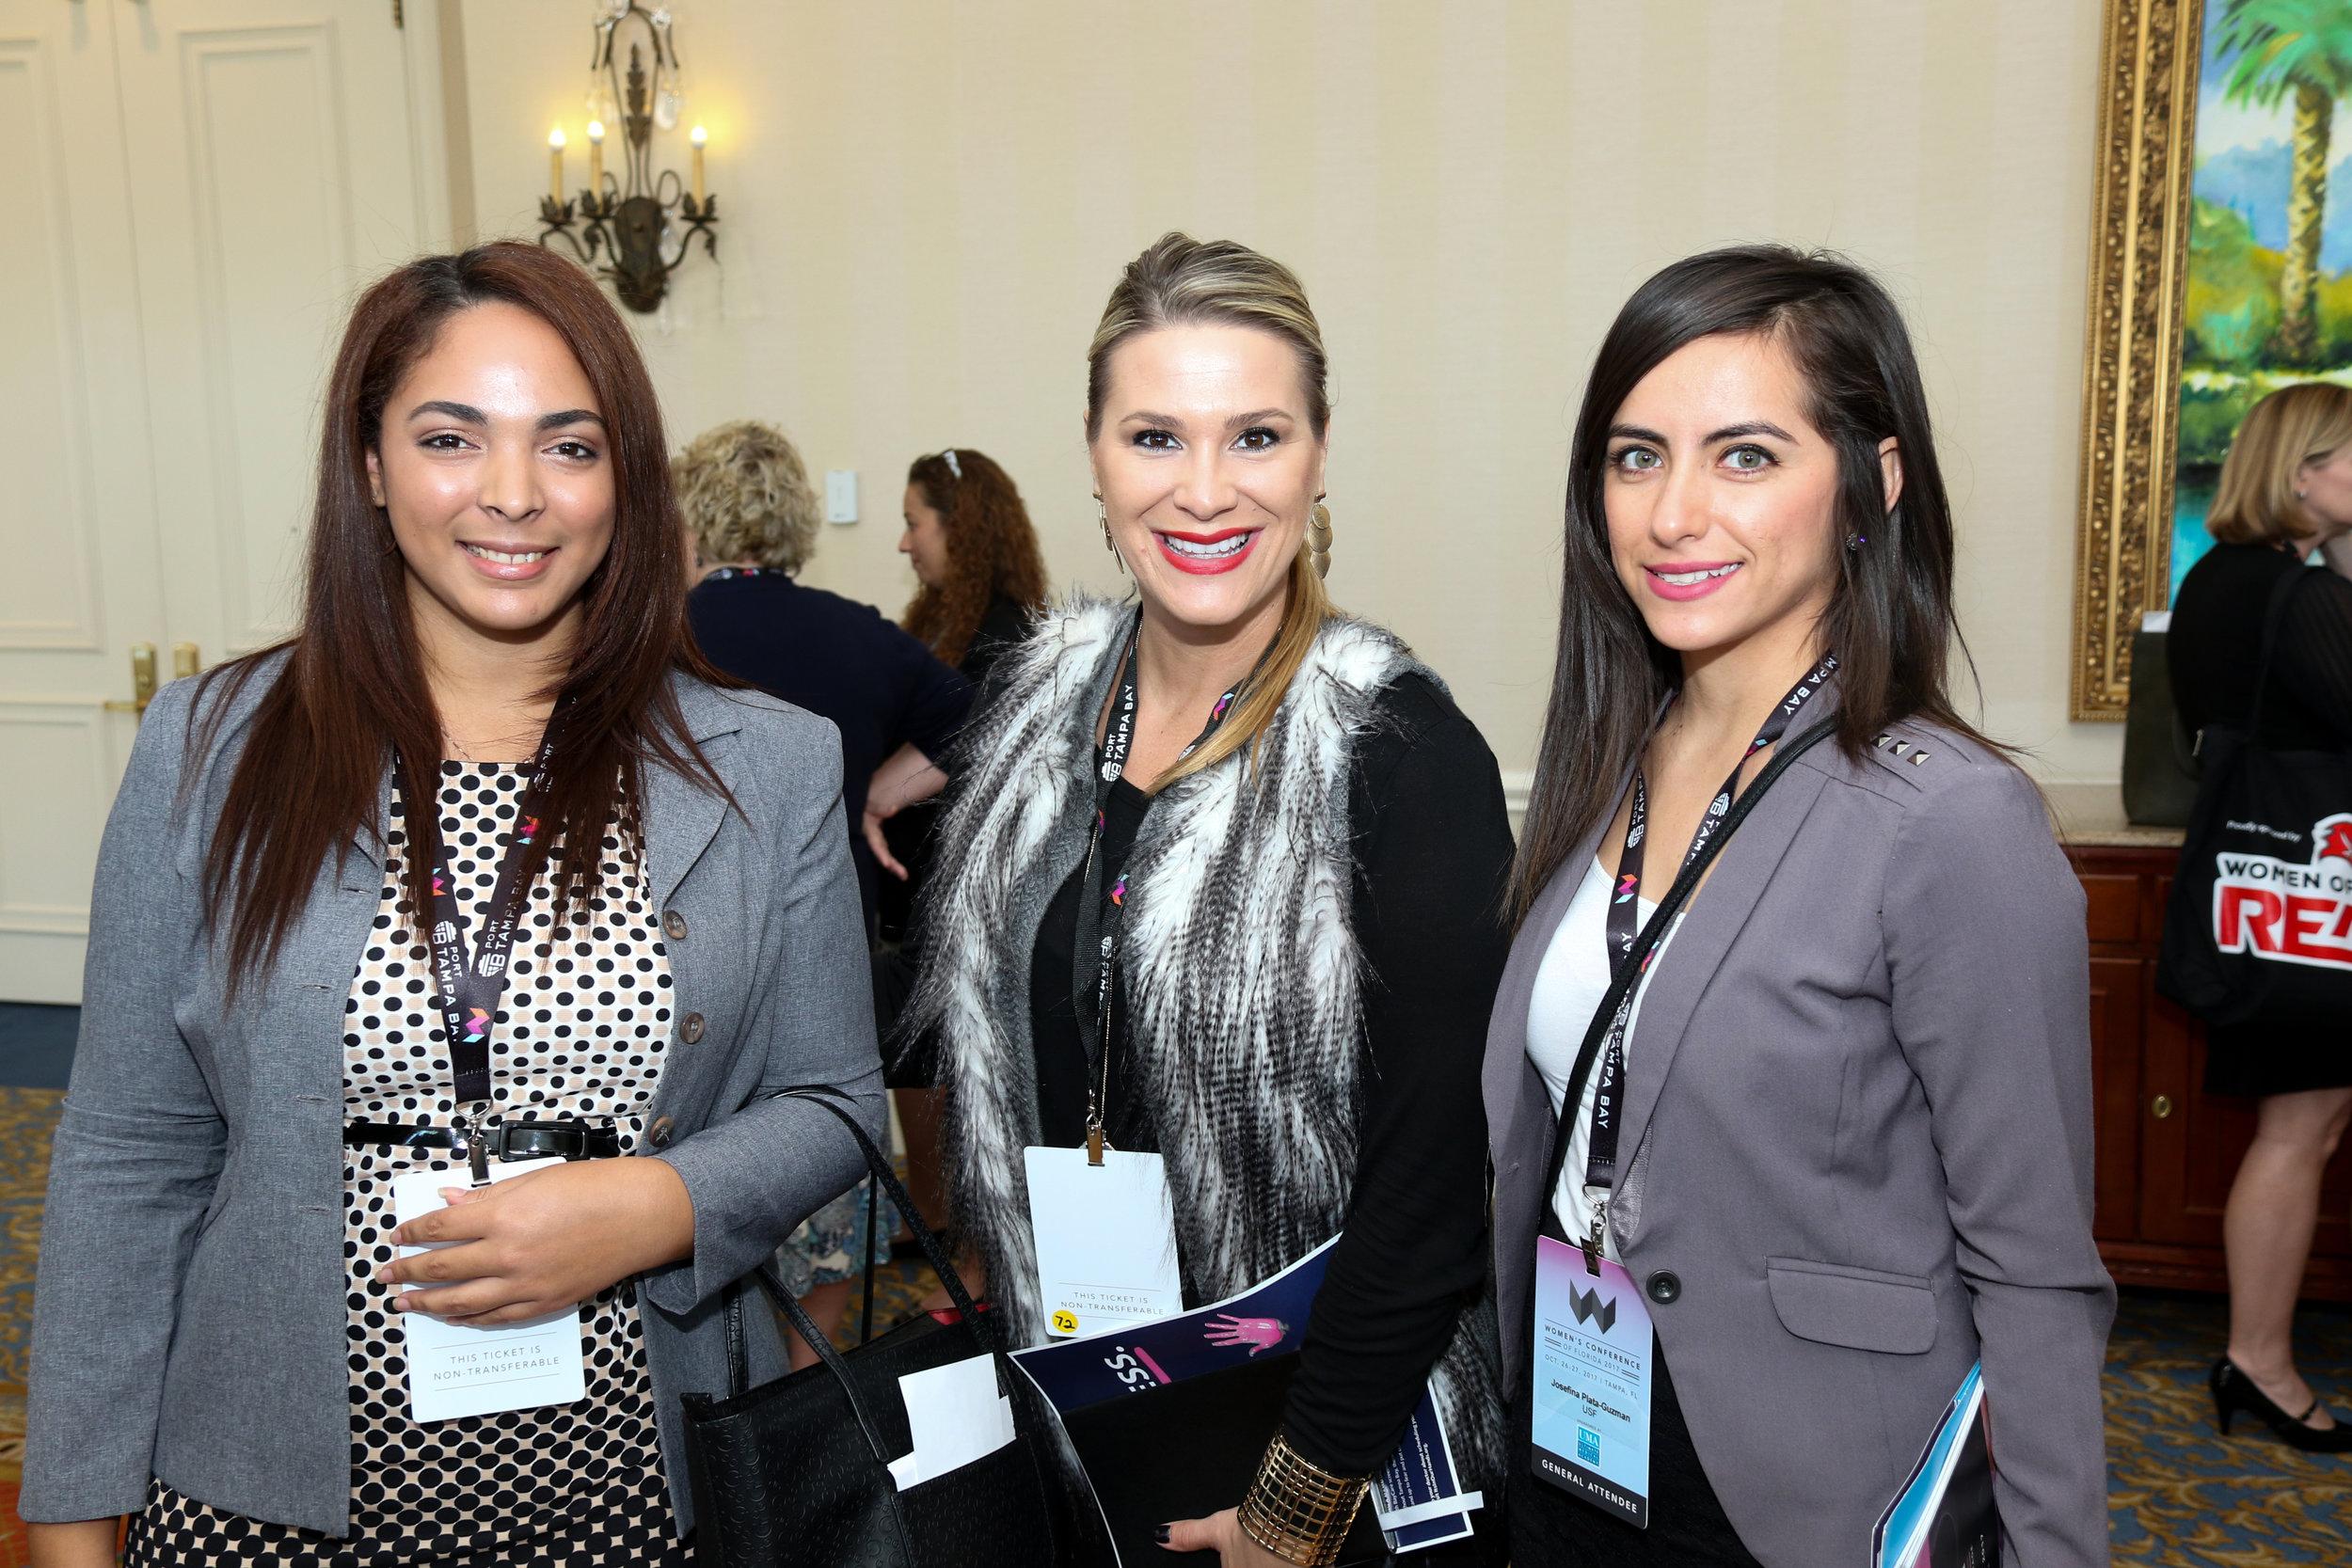 568_WomensConference_10-27-17.jpg